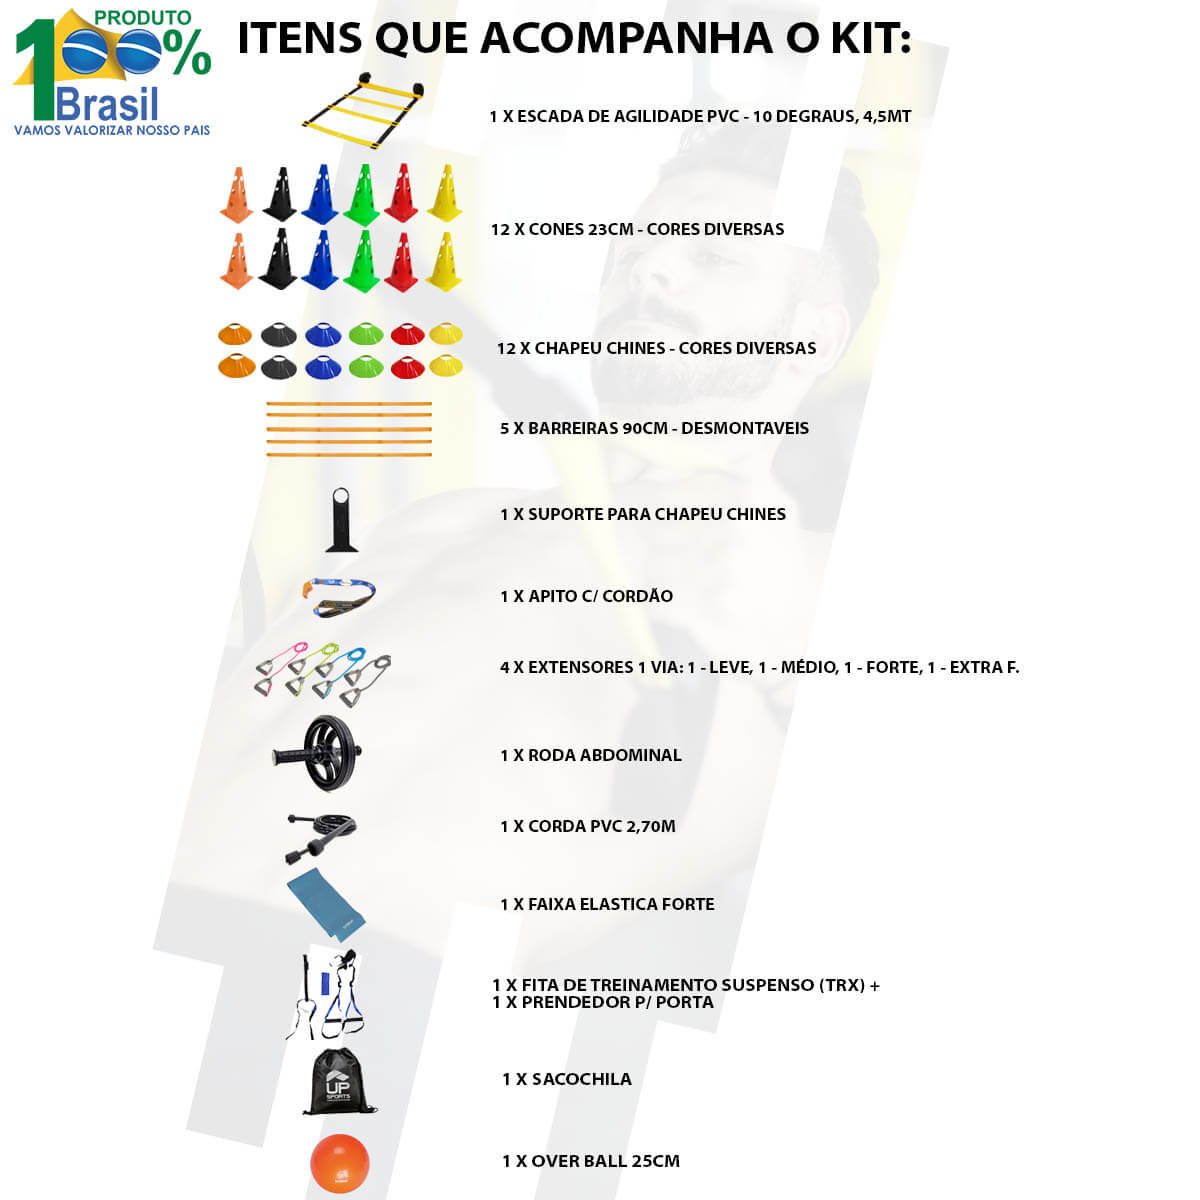 Kit Funcional Escada Cones Chapeu Bola Roda Band Extensores